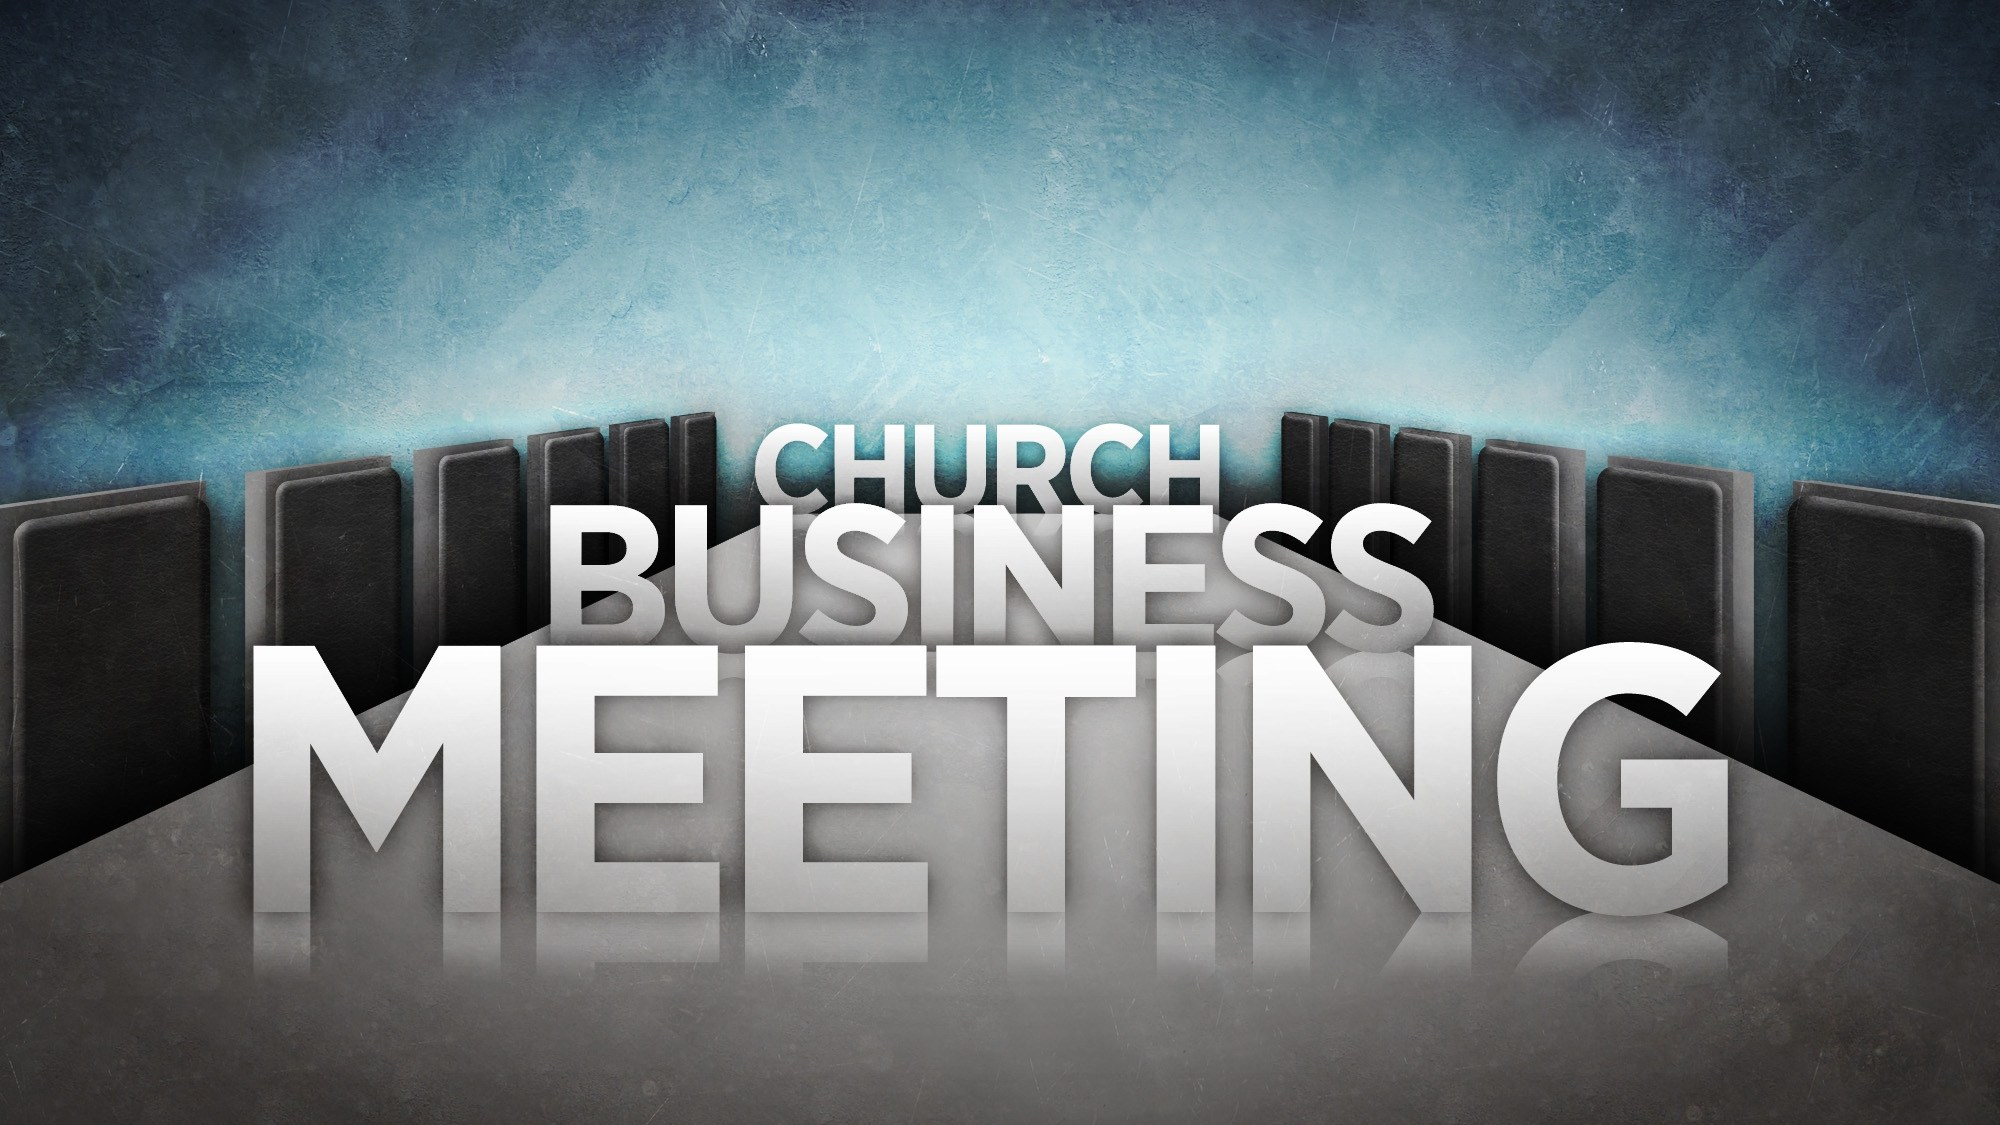 Church business meeting clipart 7 » Clipart Portal.